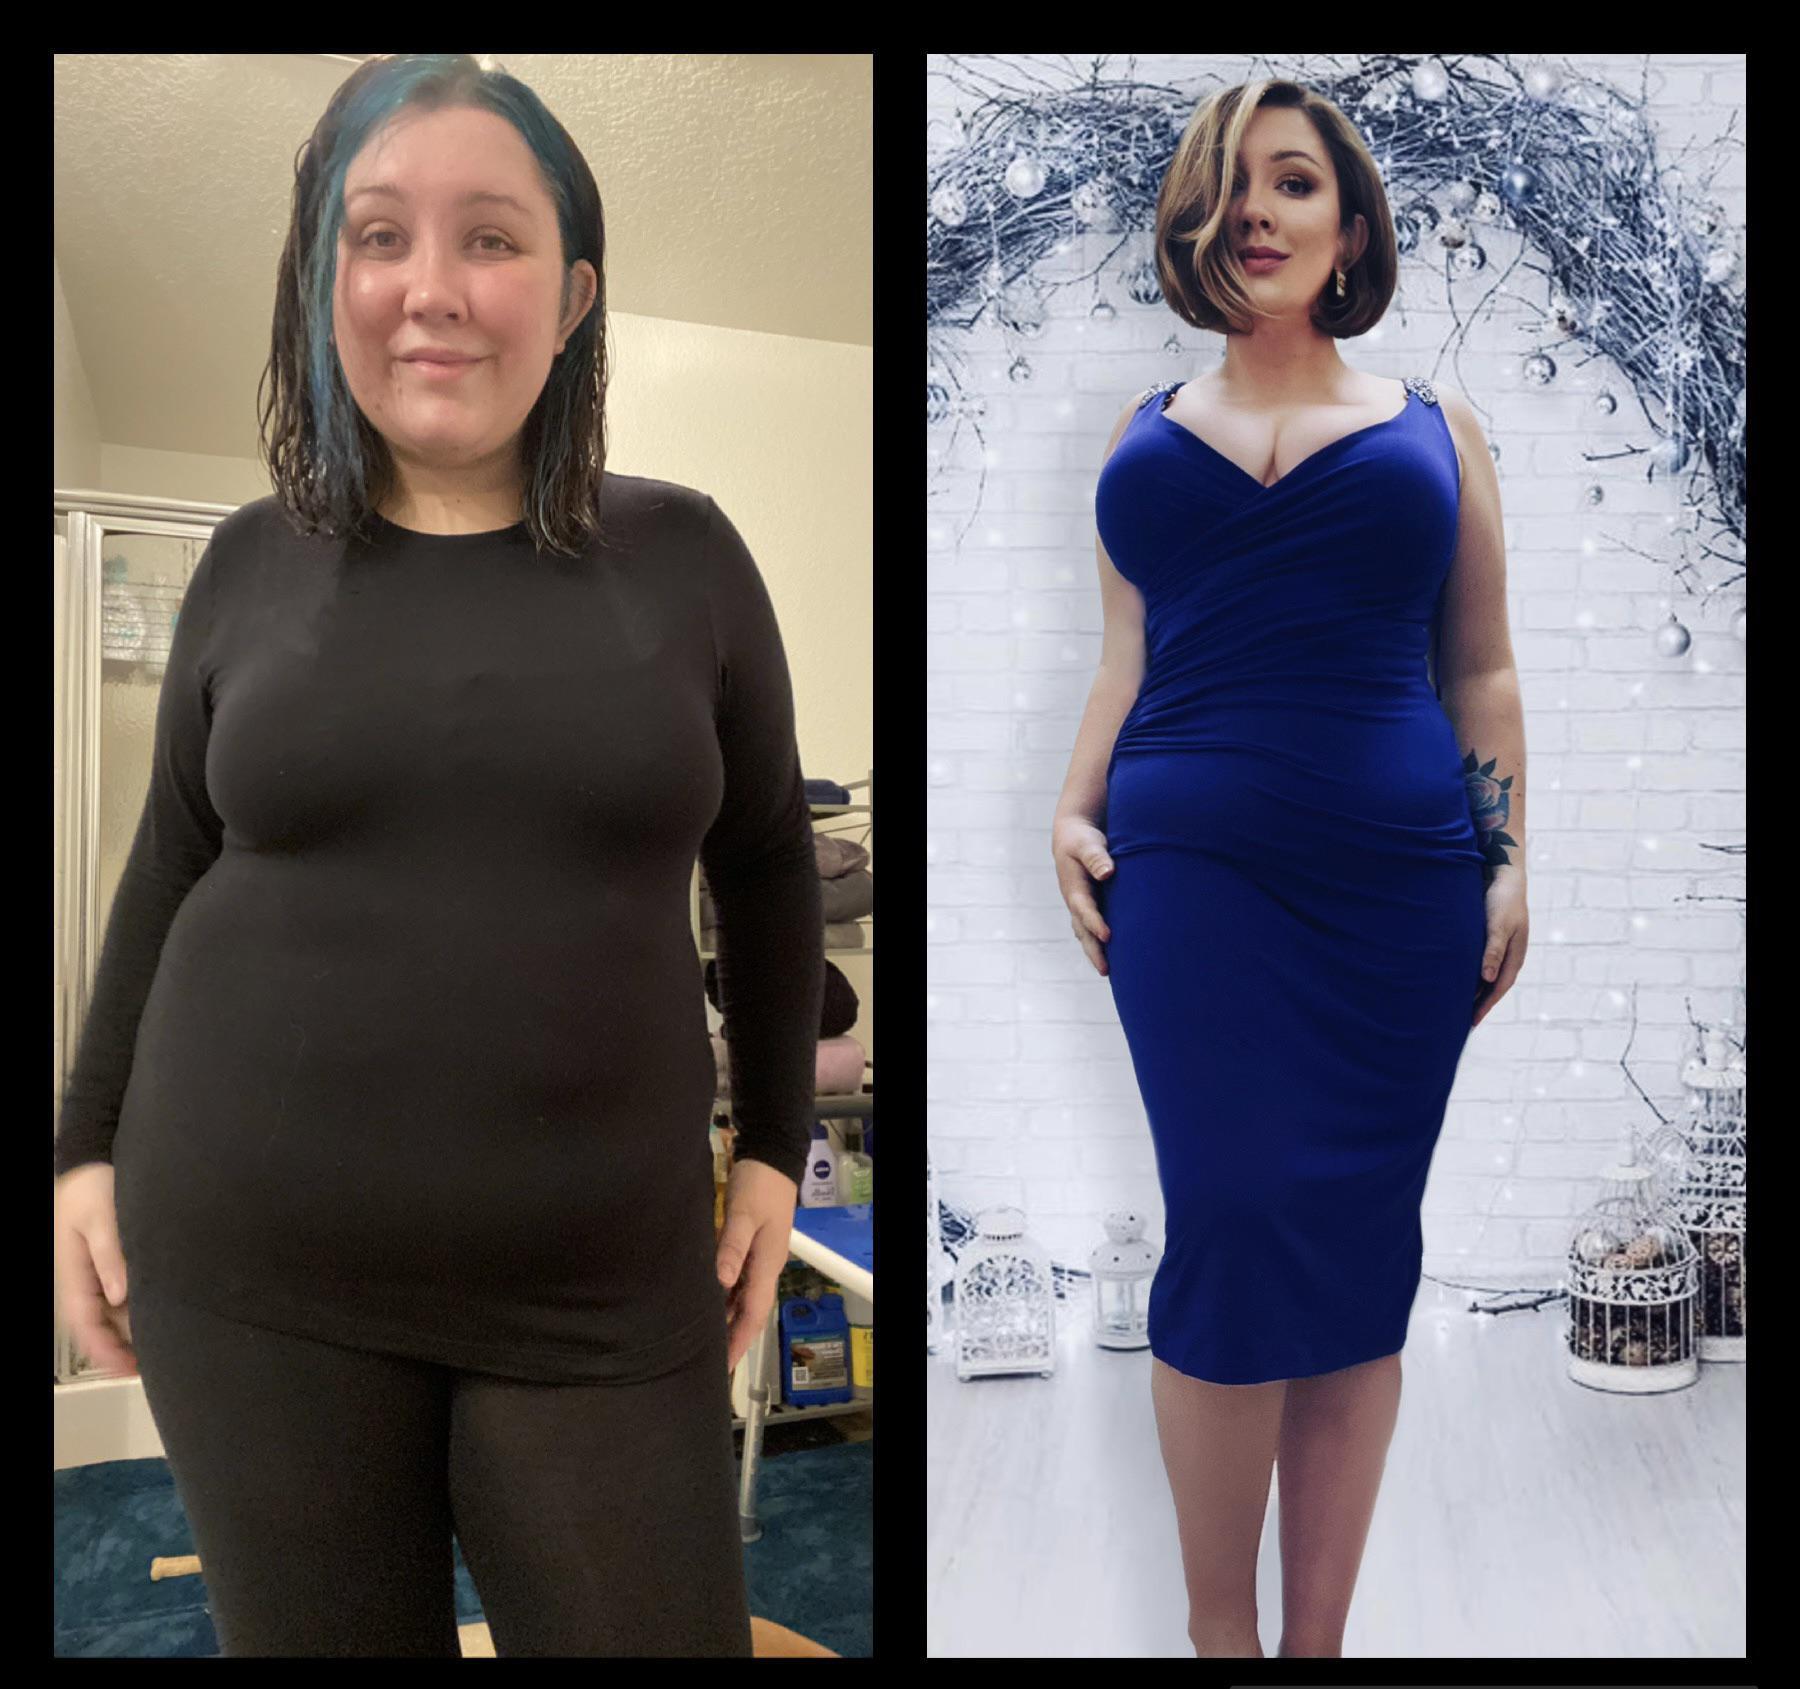 5 foot 3 Female 50 lbs Fat Loss 235 lbs to 185 lbs